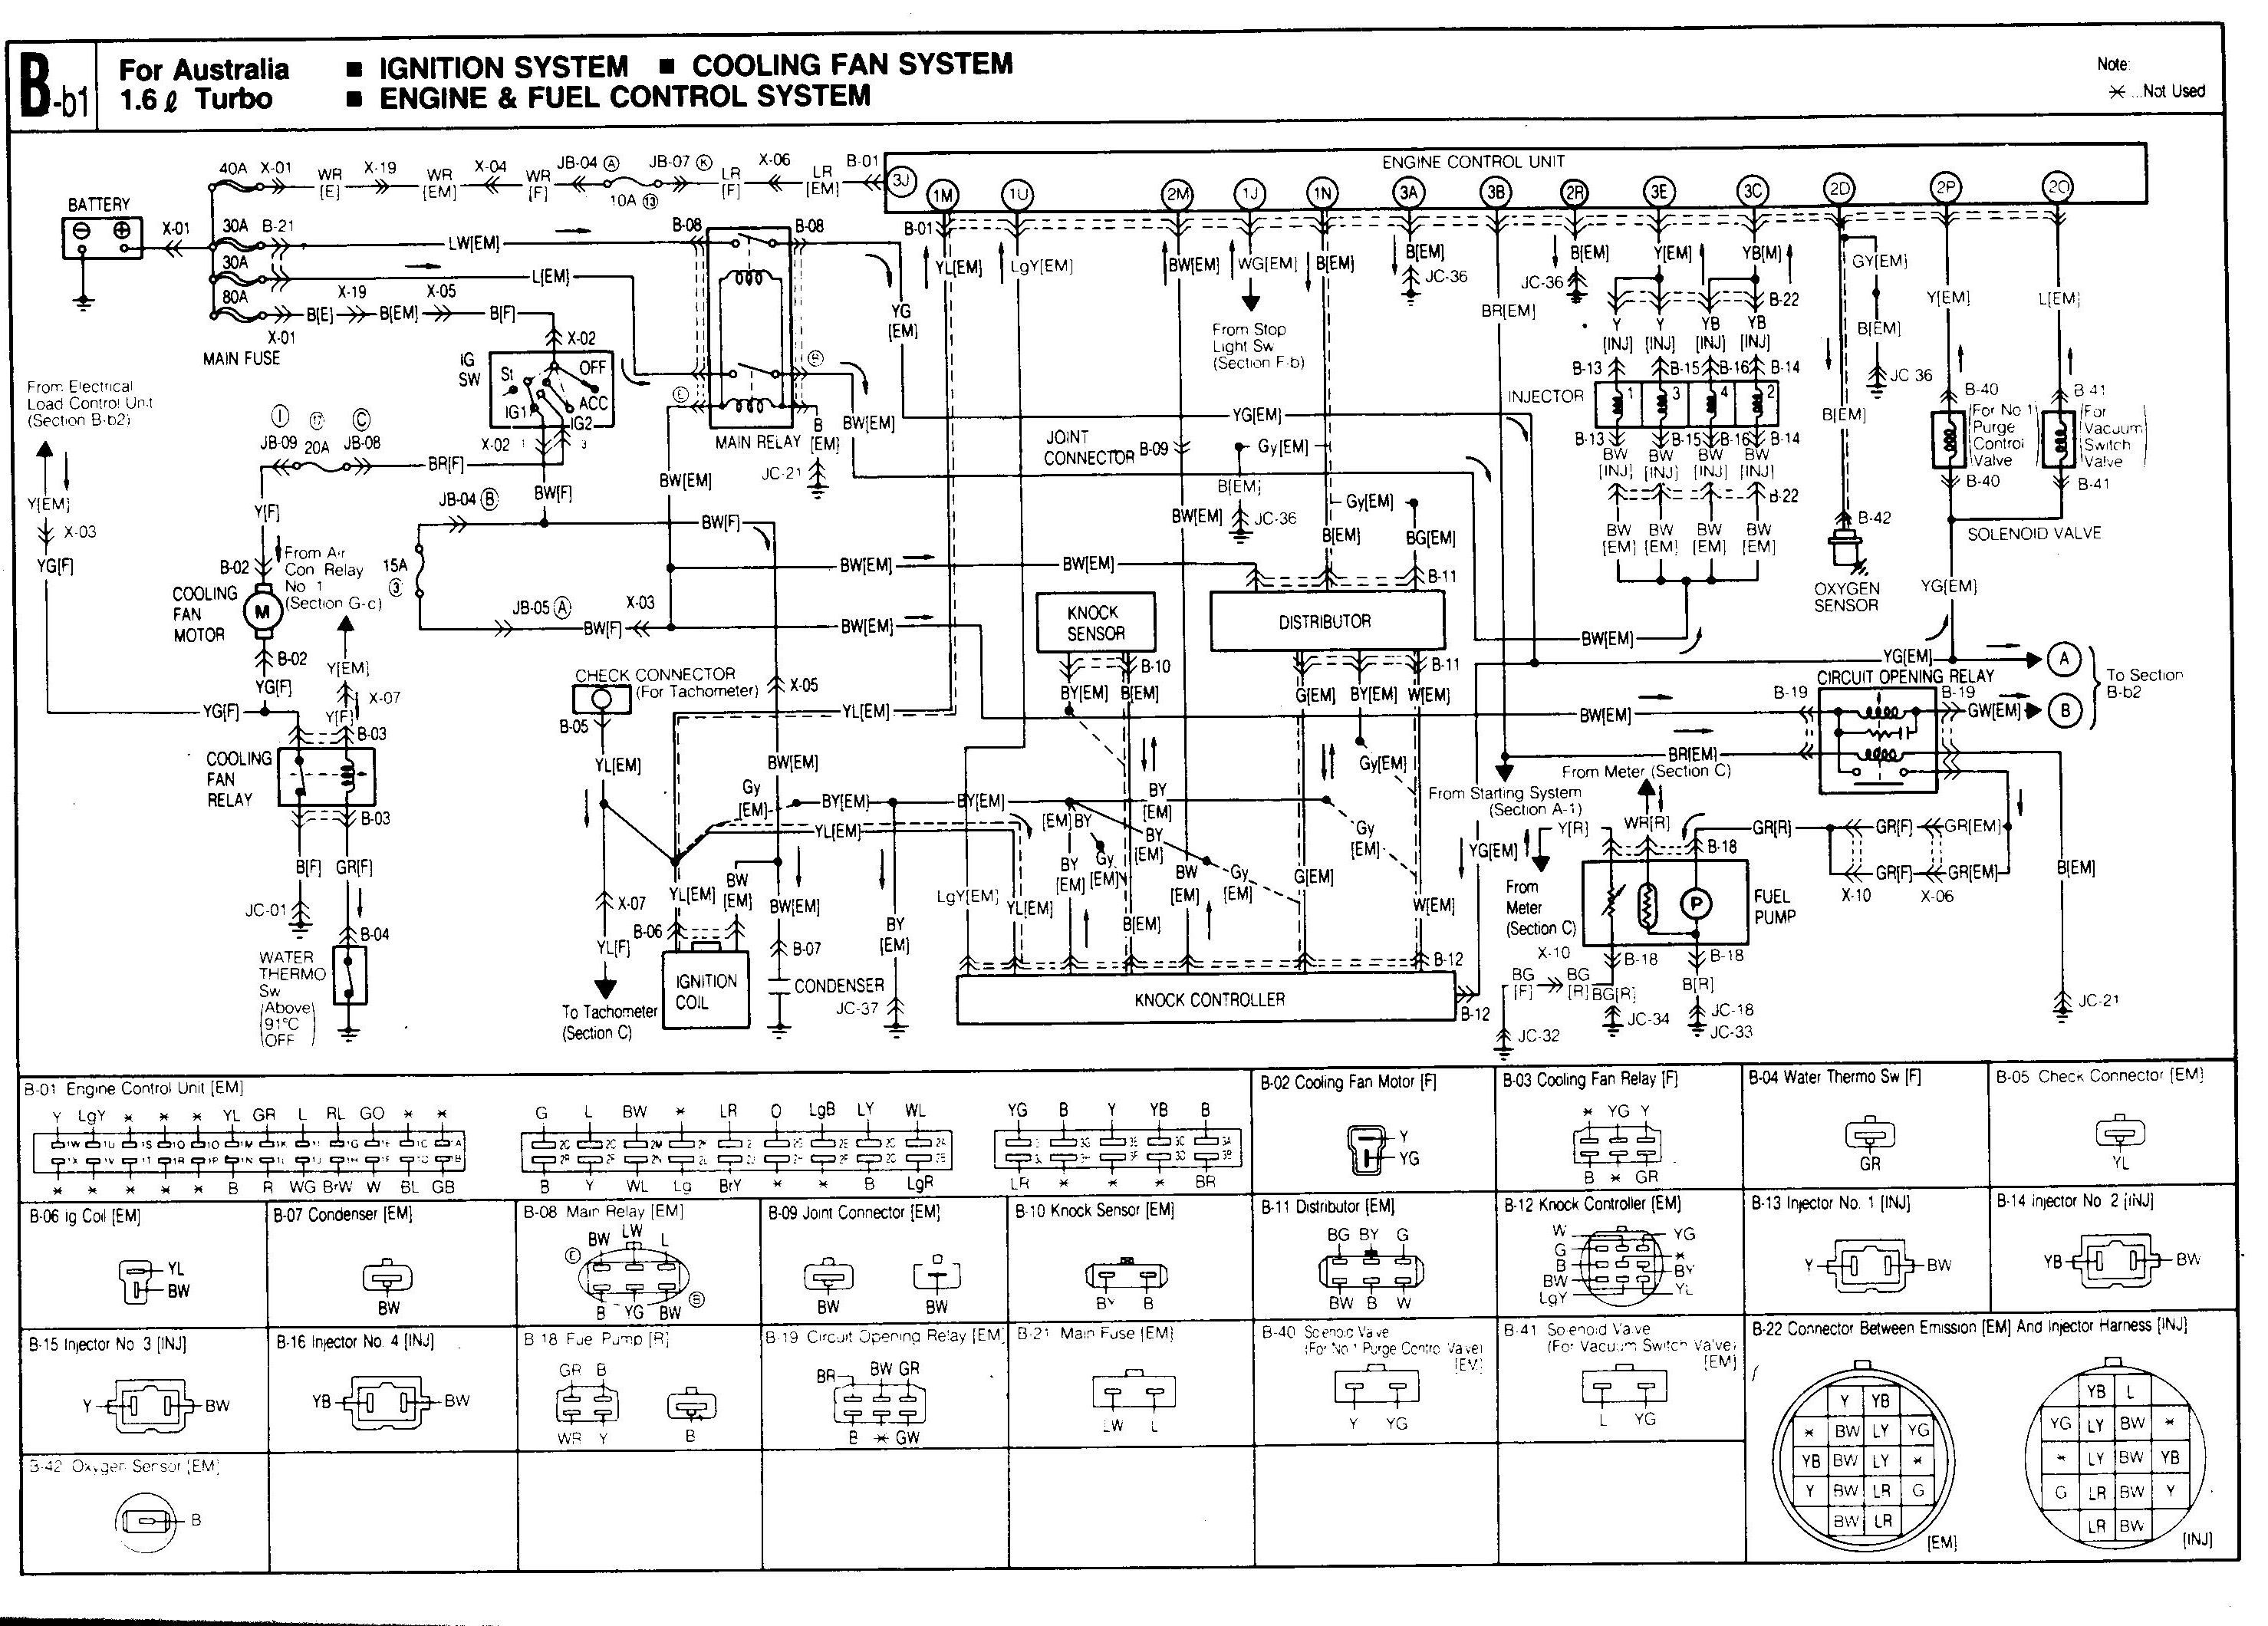 medium resolution of mazda gf wiring diagram with basic pics 626 mazda pinterest rh pinterest com 2002 mazda 626 engine diagram 1995 mazda 626 fuse diagram